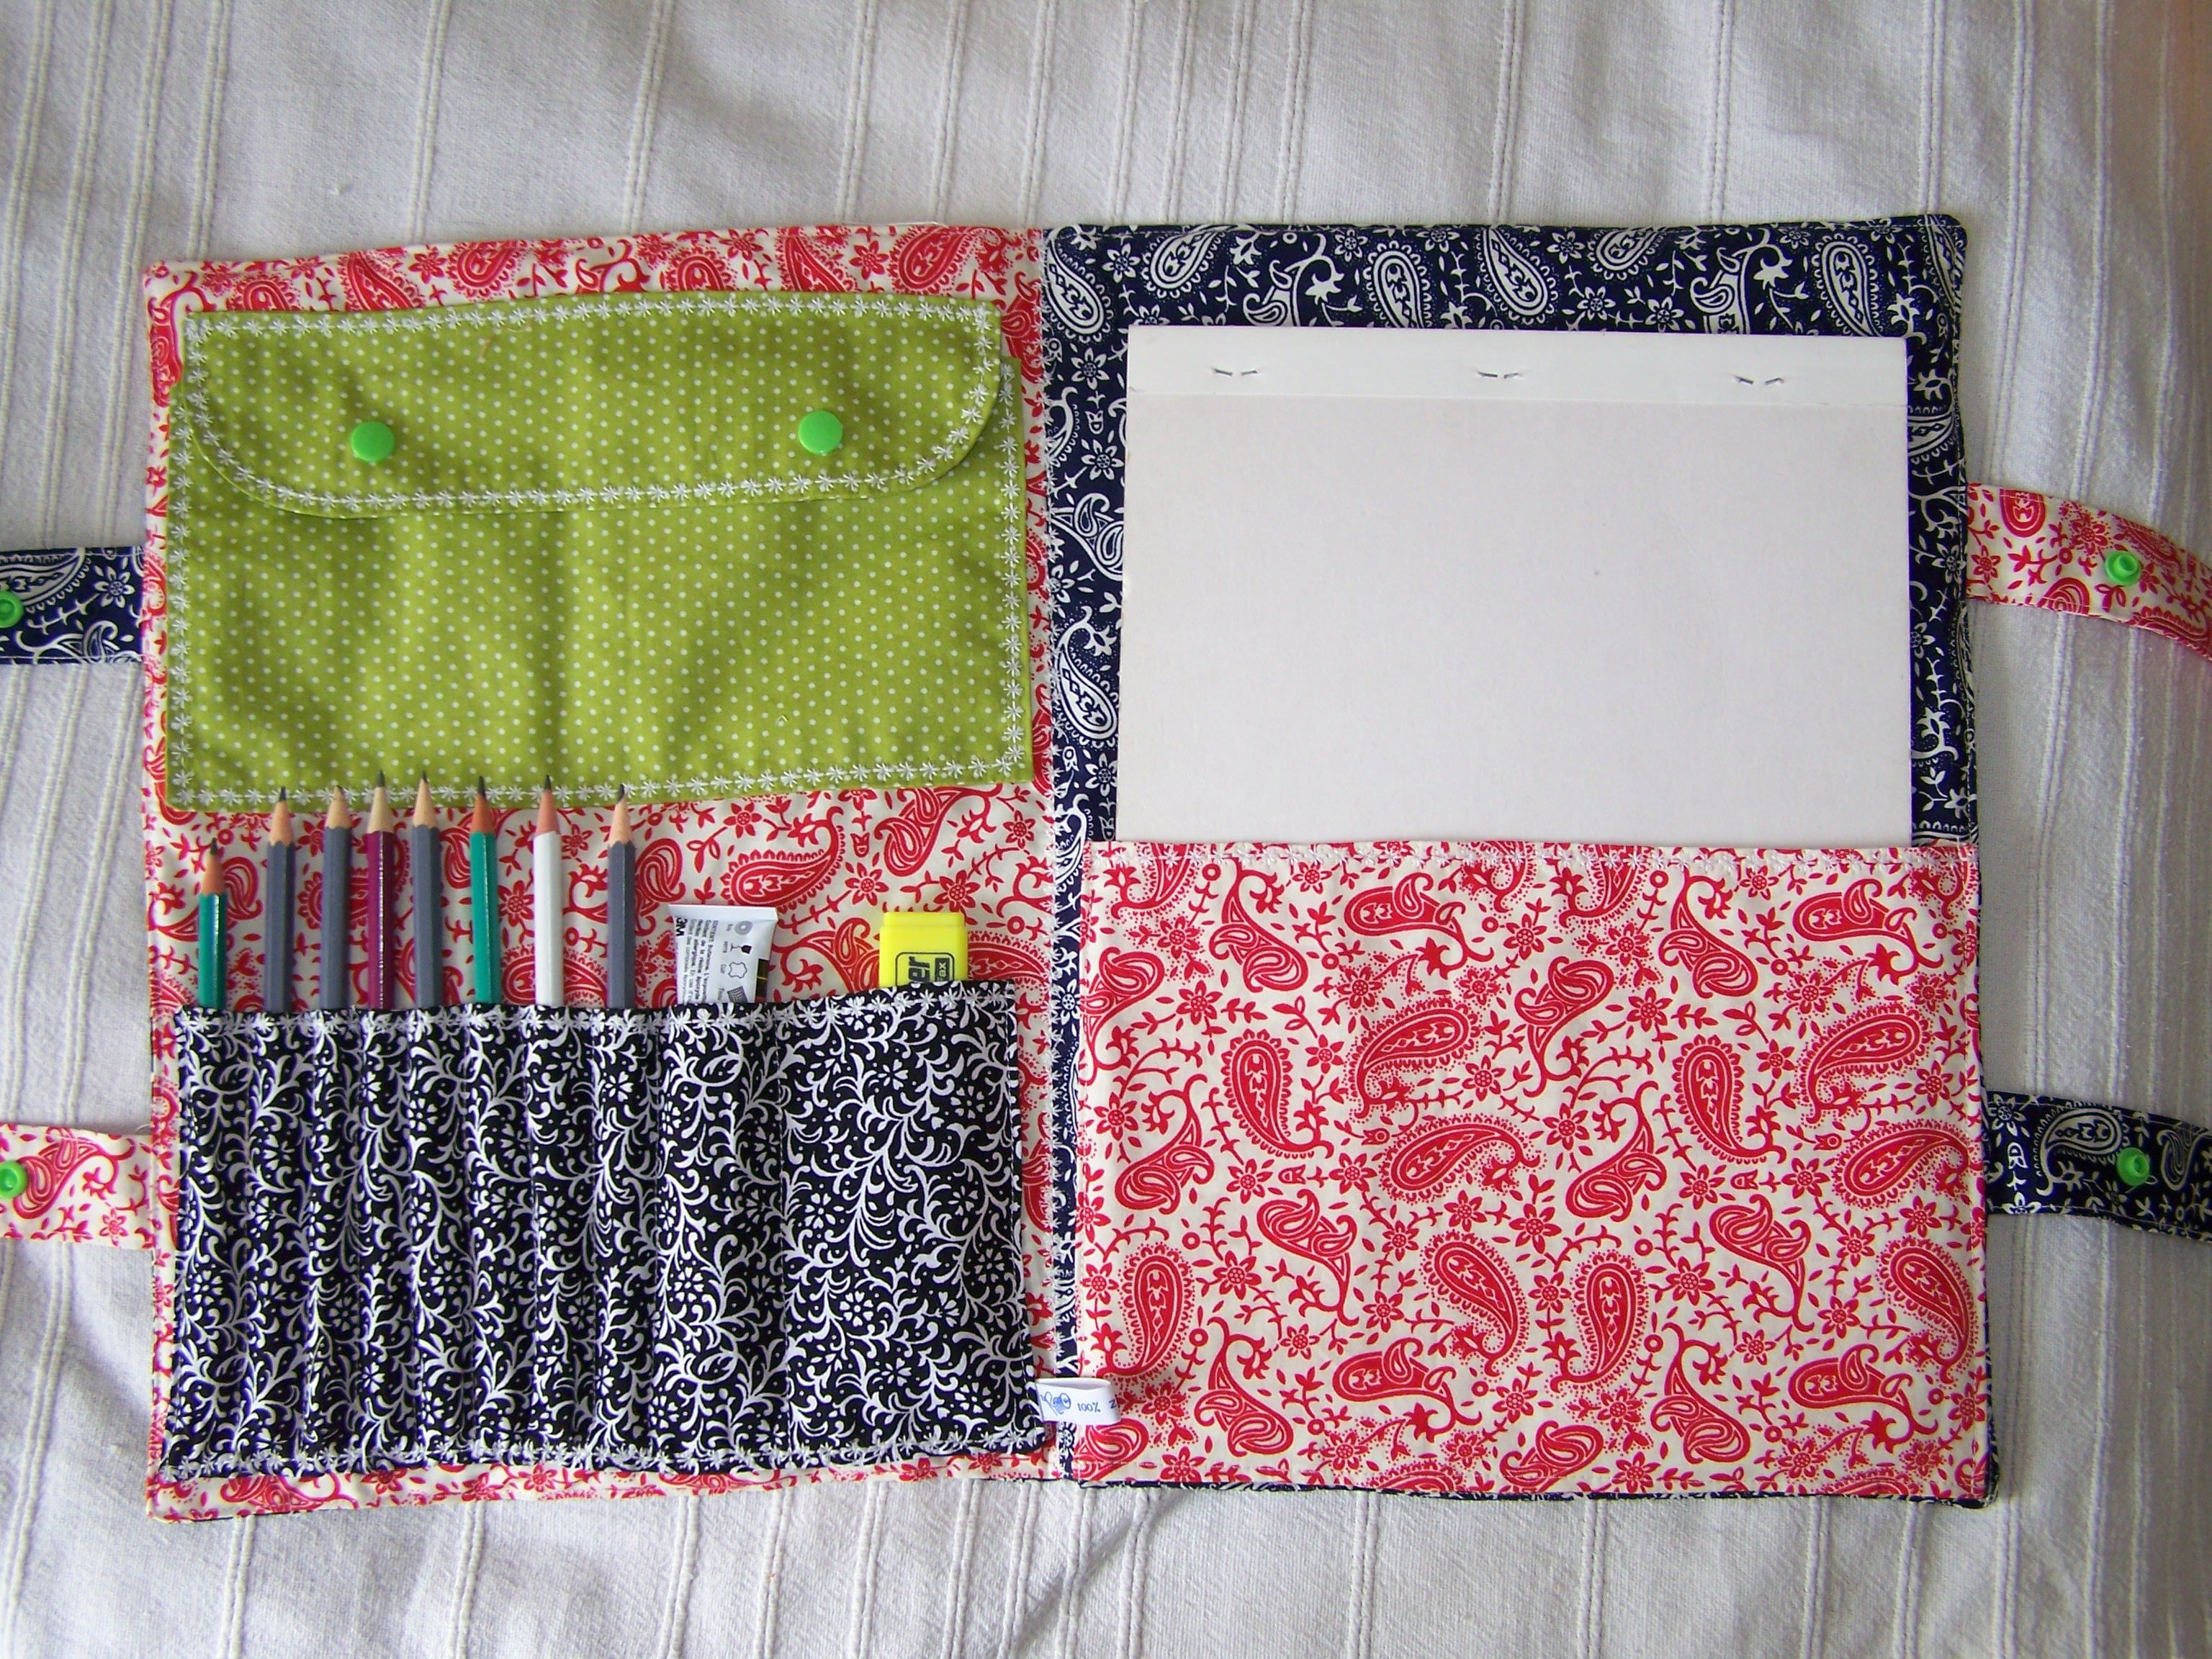 Sac d'artiste - cotons http://www.alittlemercerie.com/boutique/liberty_me-364951.html - tuto gratuit, gabarit http://sweetanything.com/uploads/sac-artiste-tuto-photo.pdf